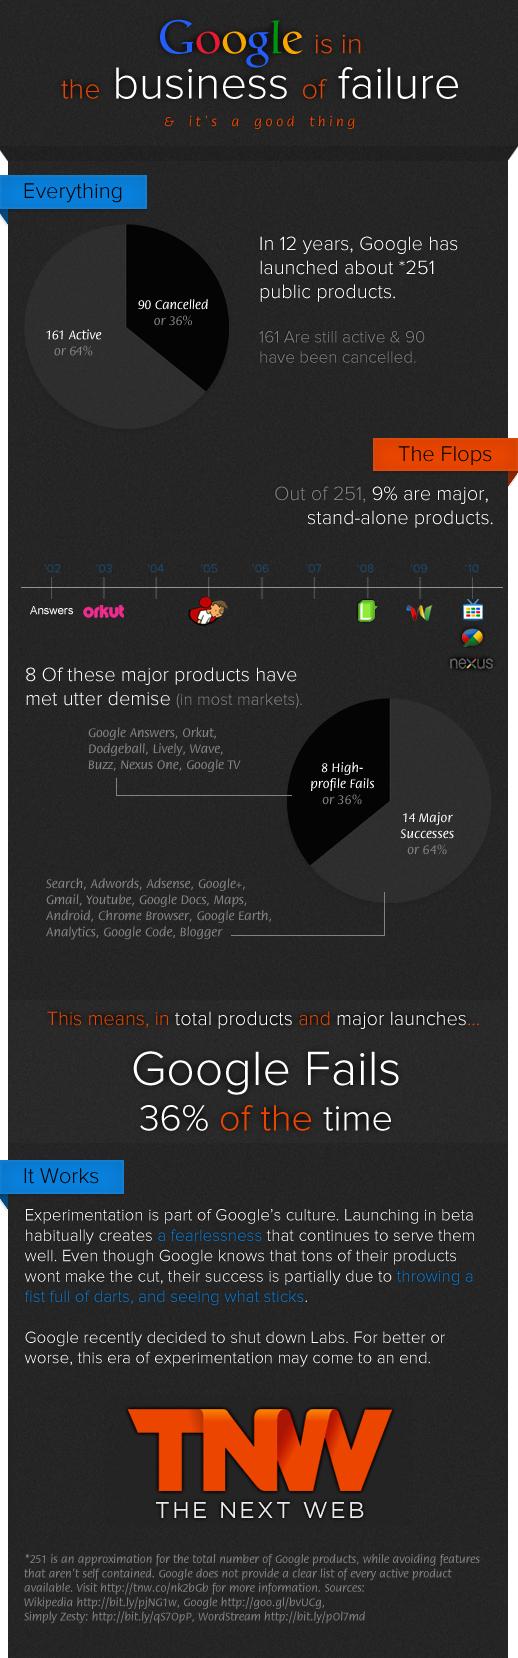 Les échecs Google